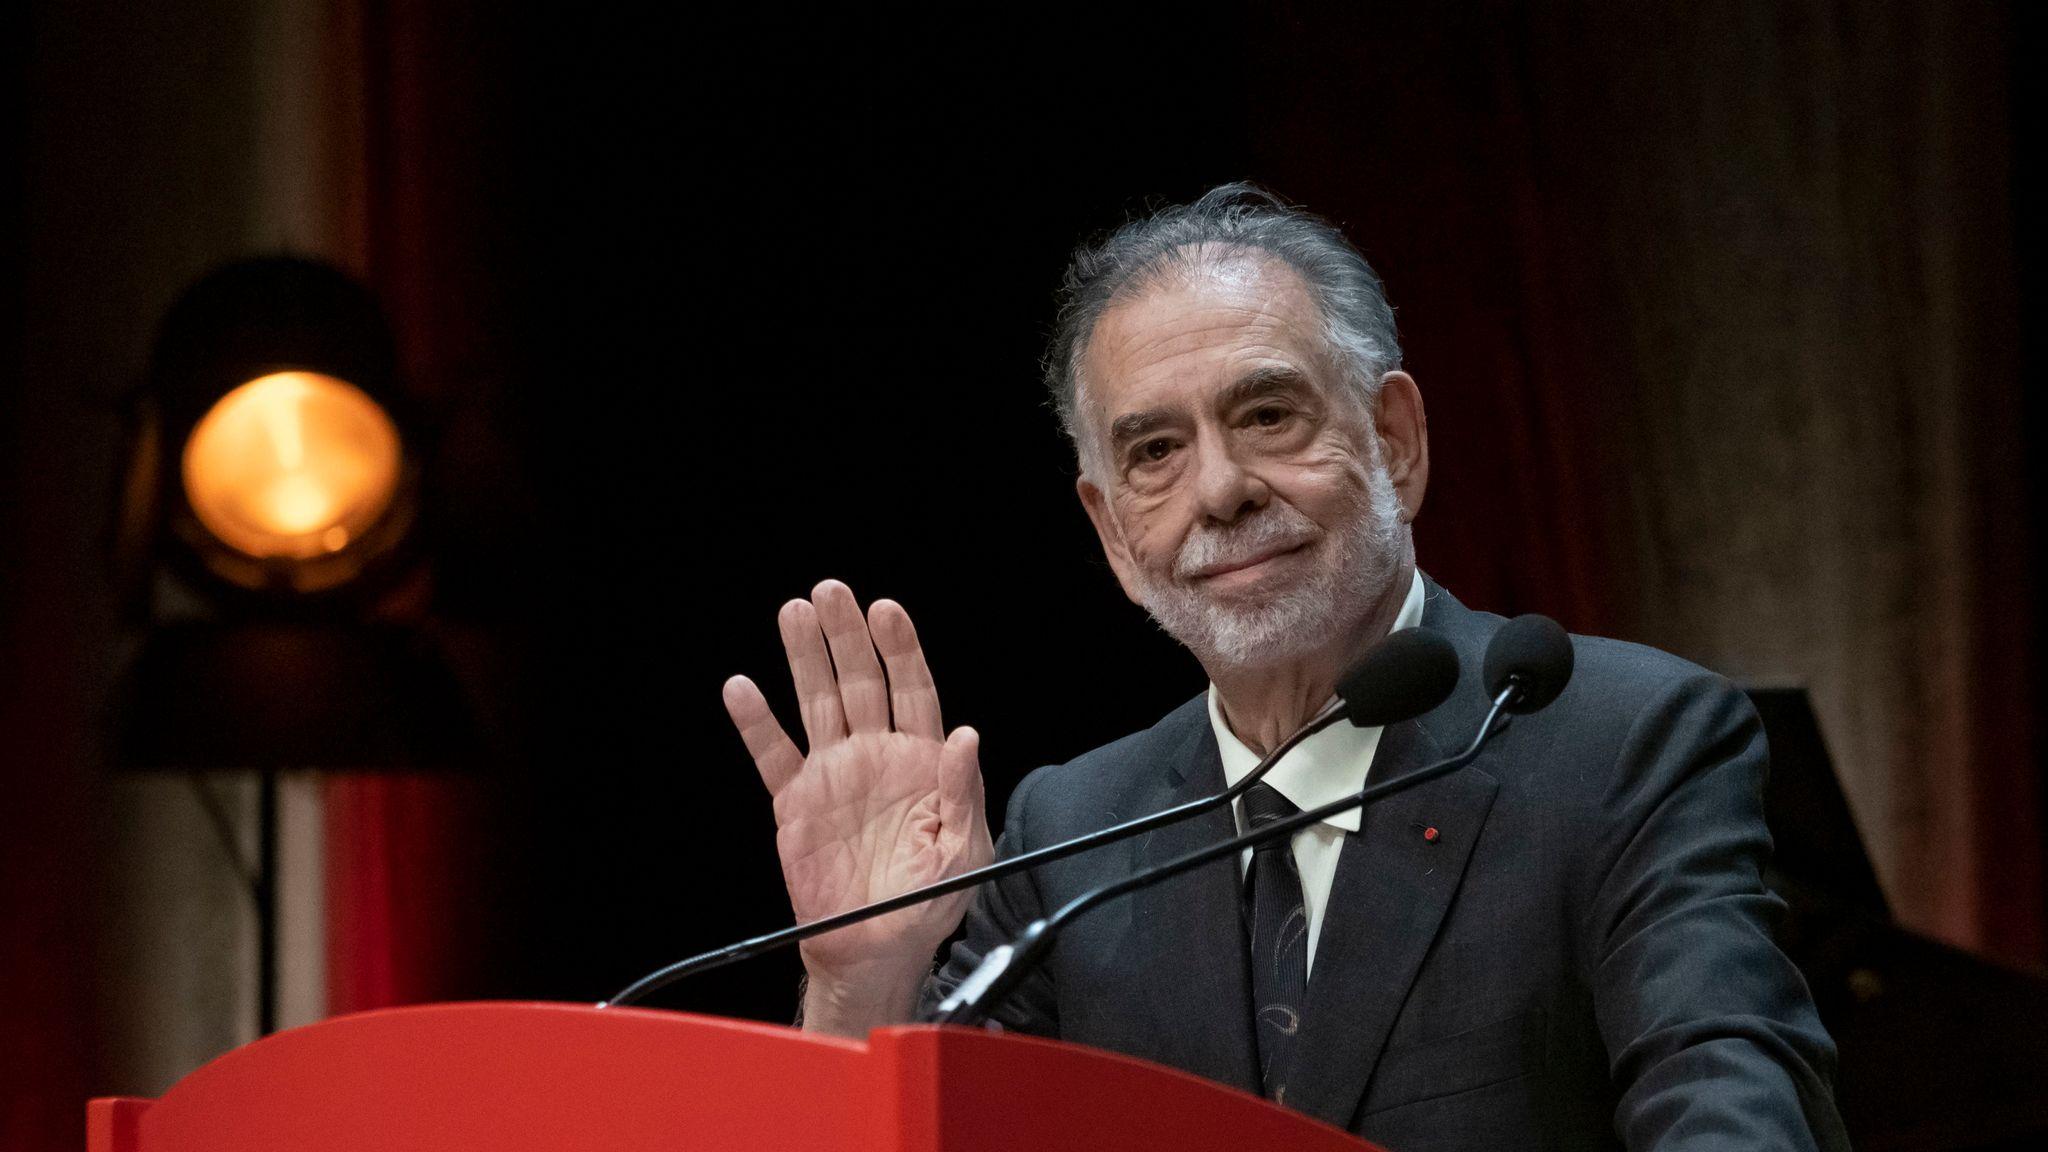 Francis Ford Coppola brands Marvel superhero films 'despicable'